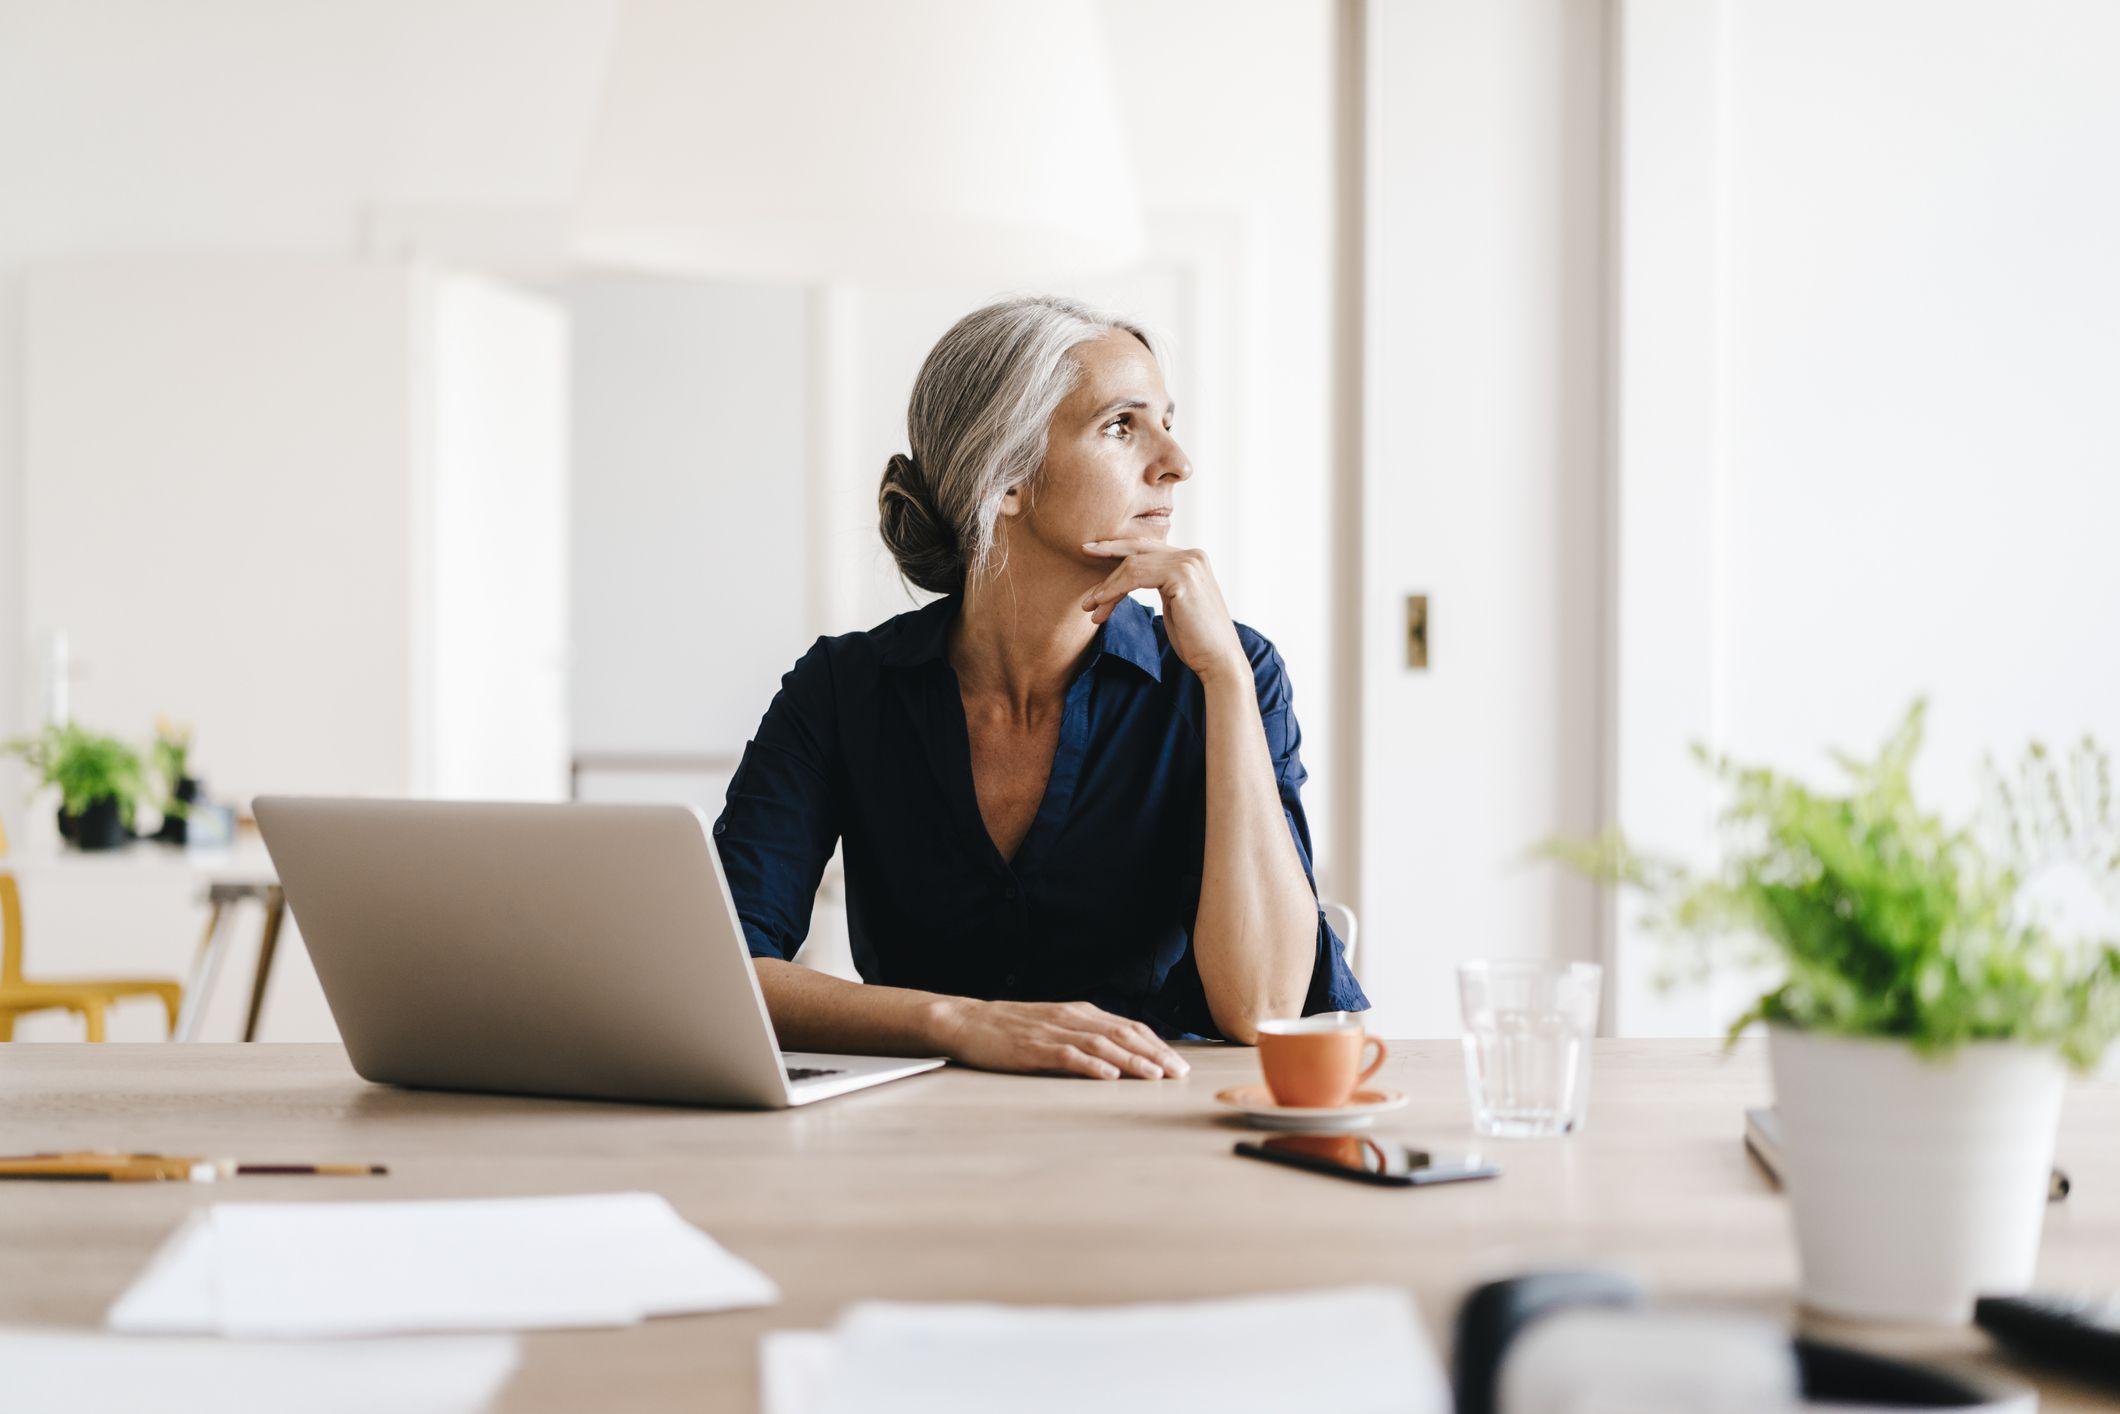 Woman sitting at laptop, thinking